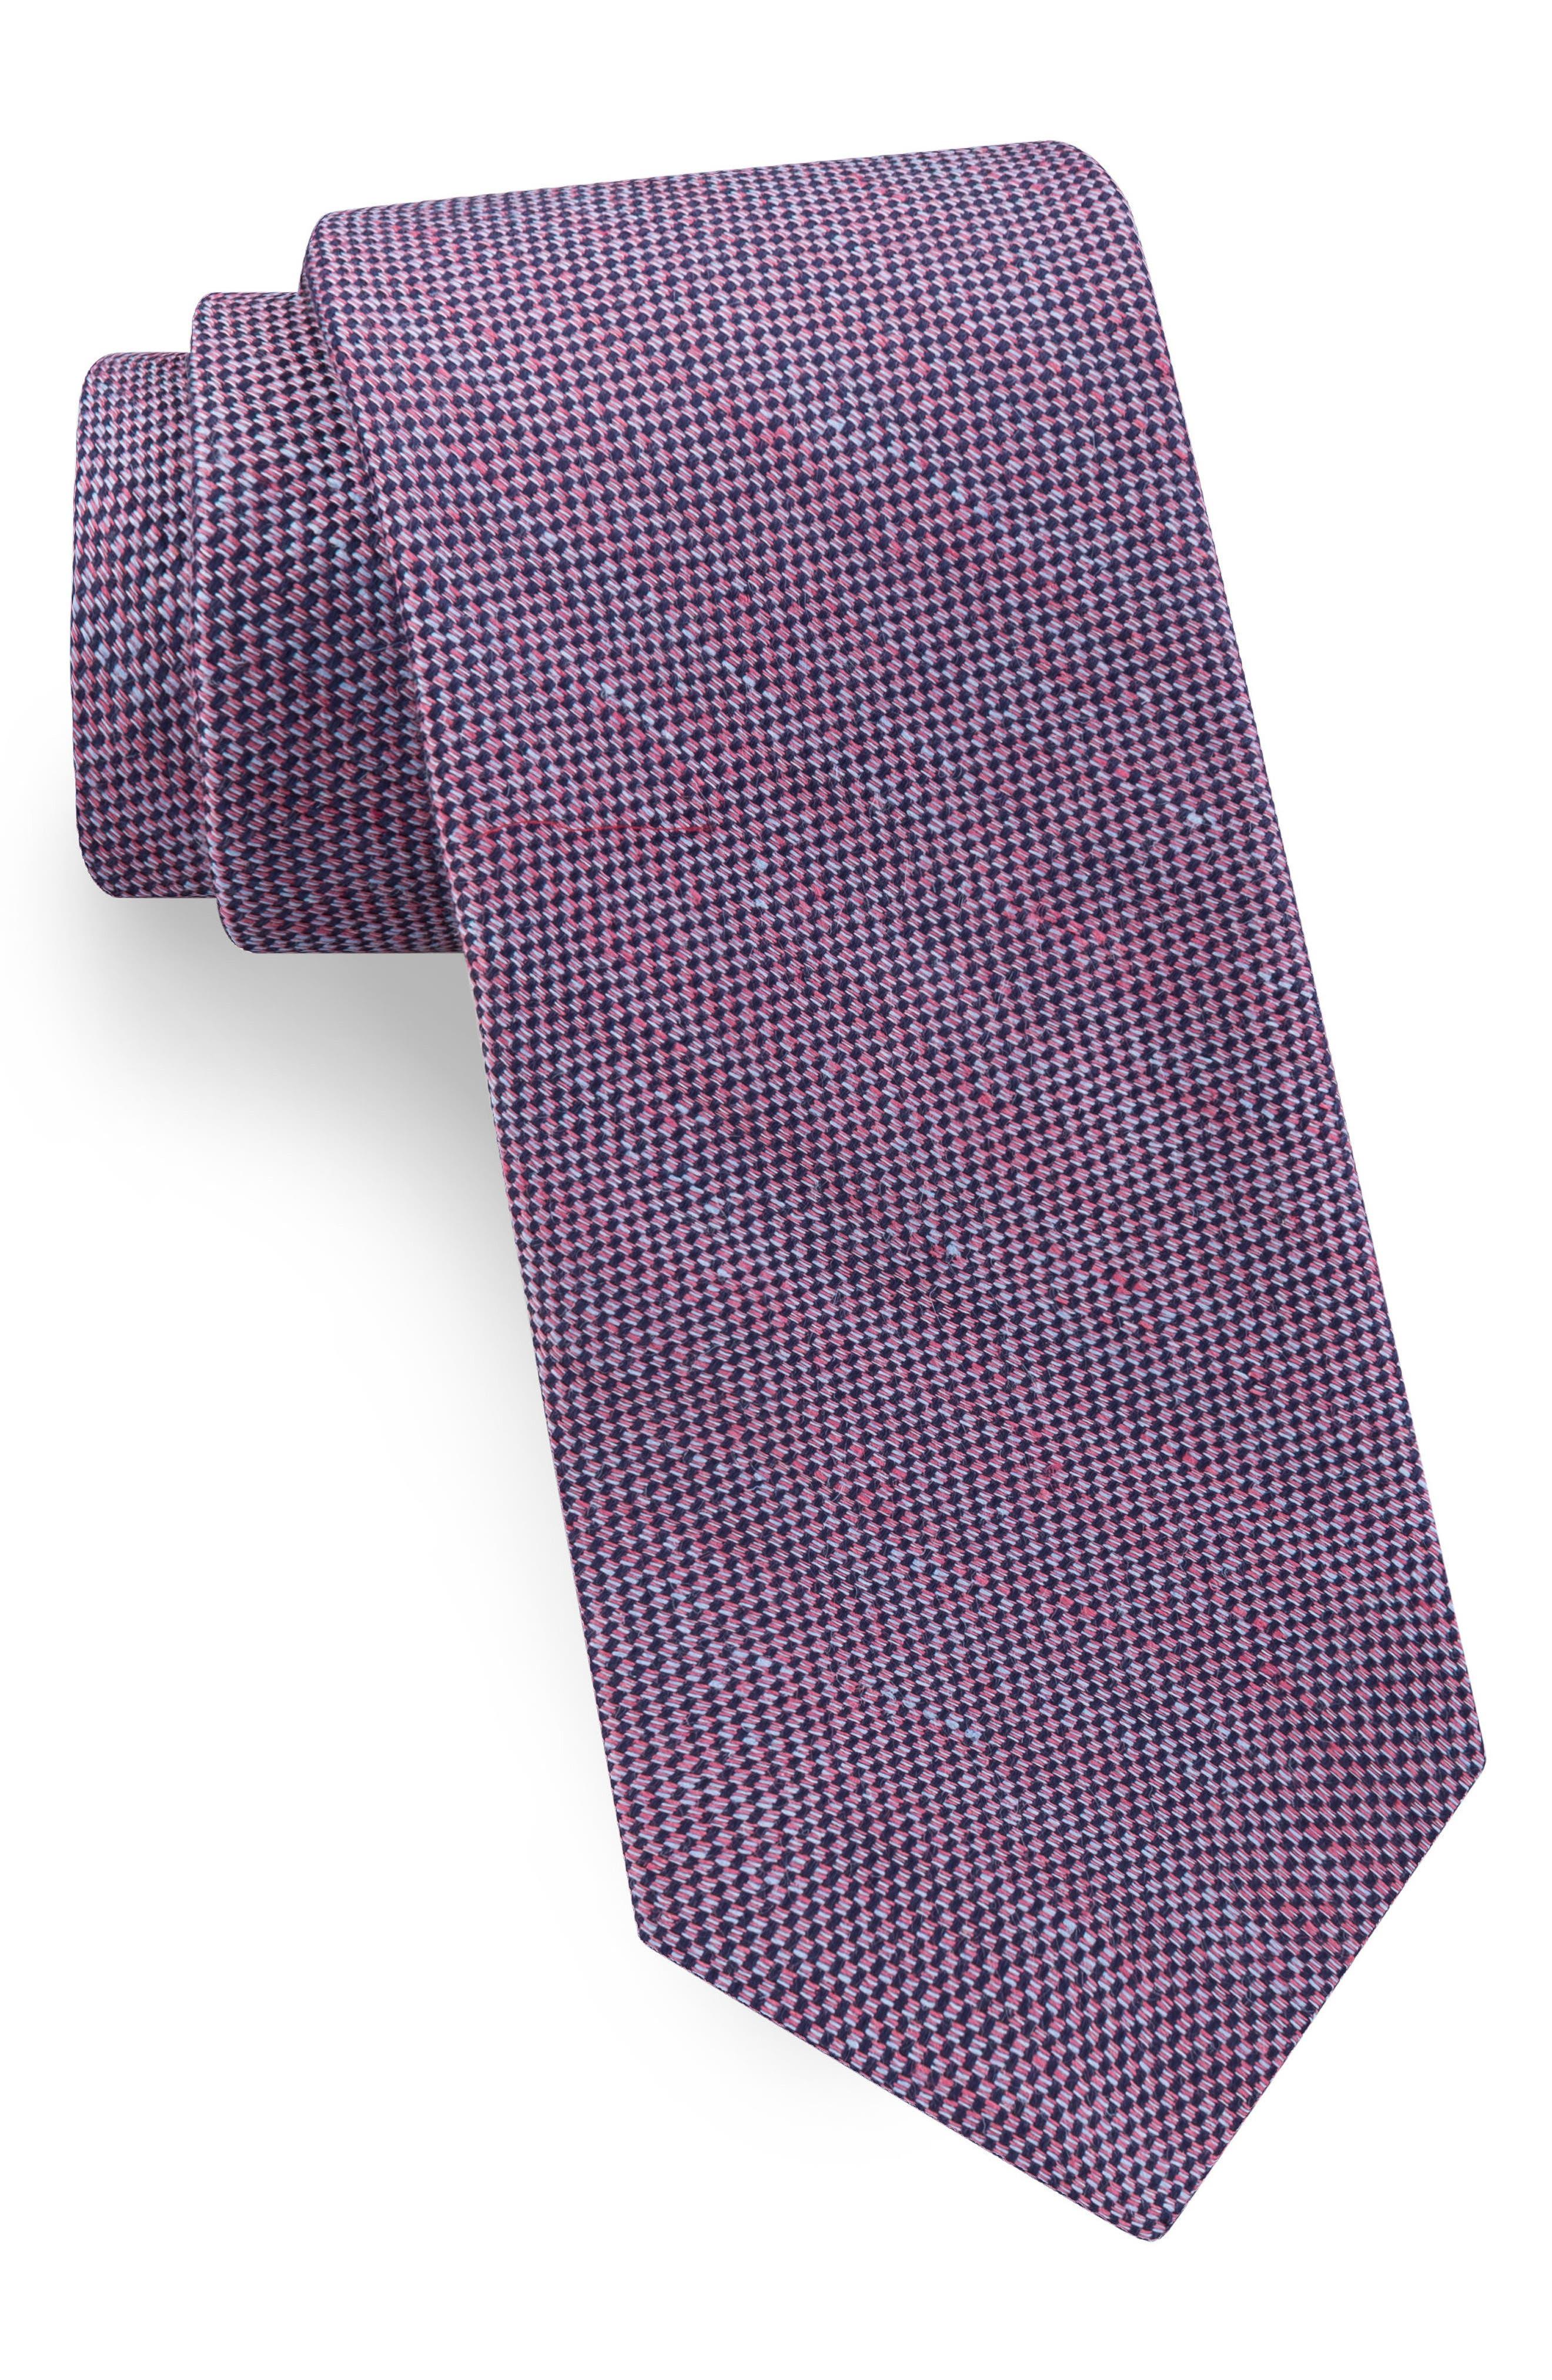 Main Image - Ted Baker London Textured Linen & Silk Tie